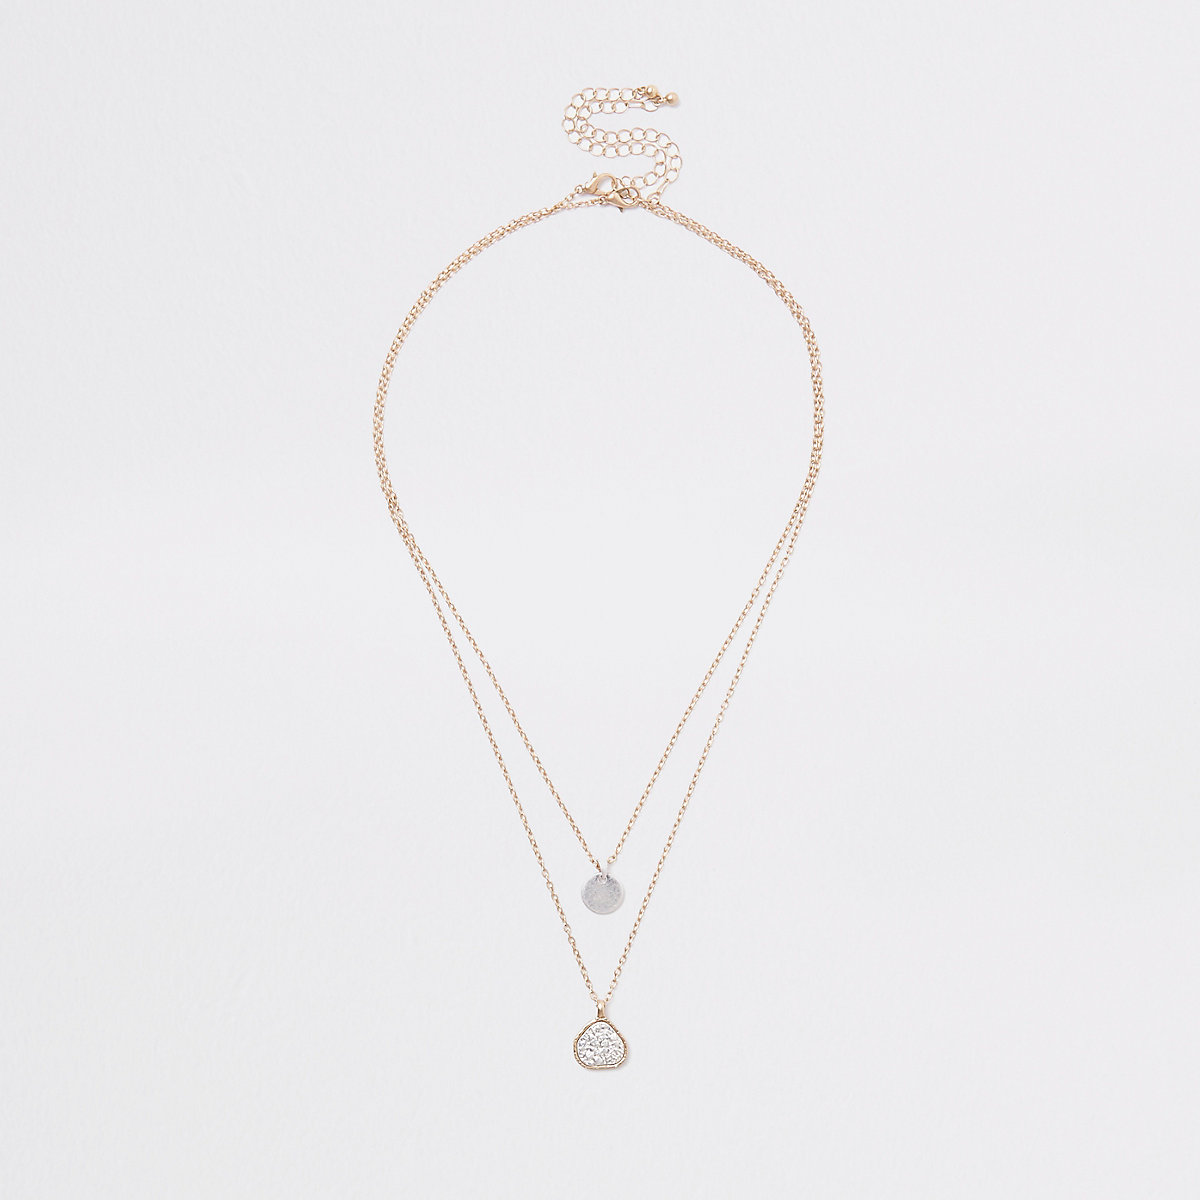 Gold tone double textured pendant necklace